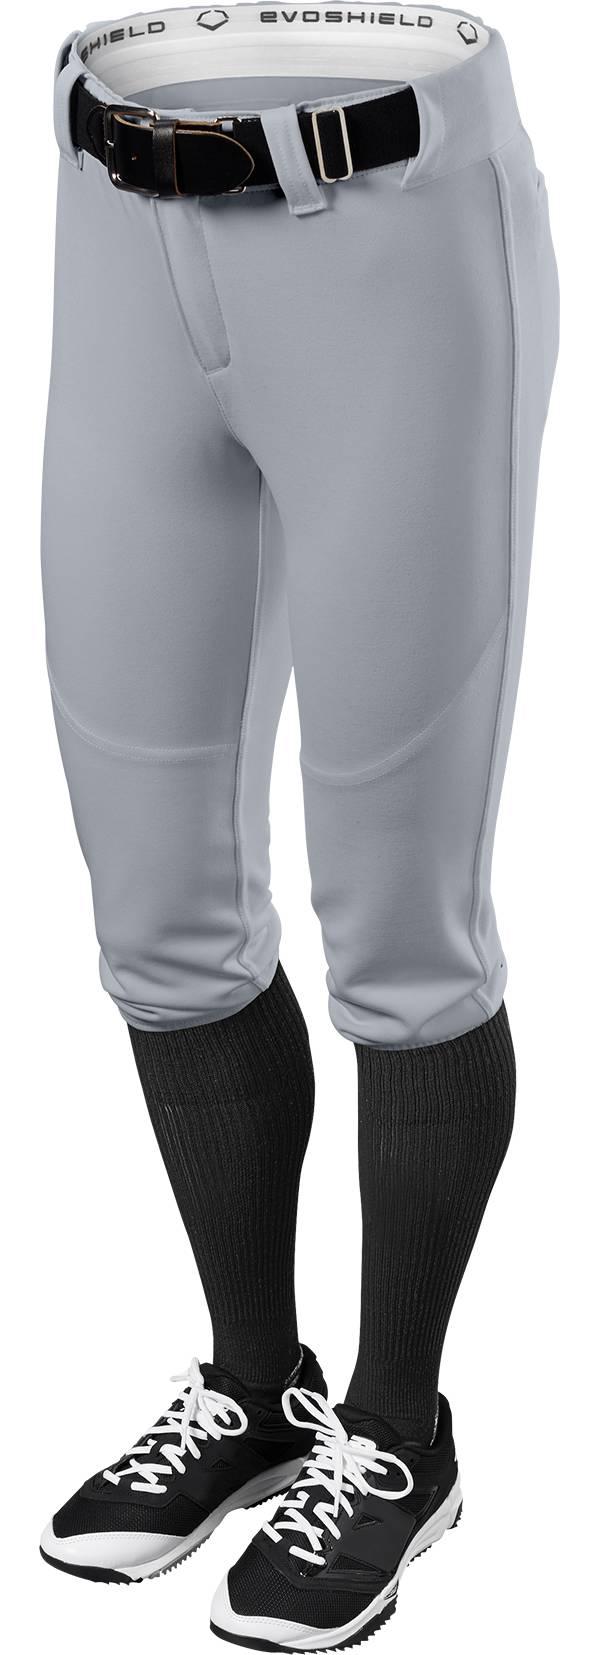 EvoShield Women's FX Low Rise Softball Pants product image